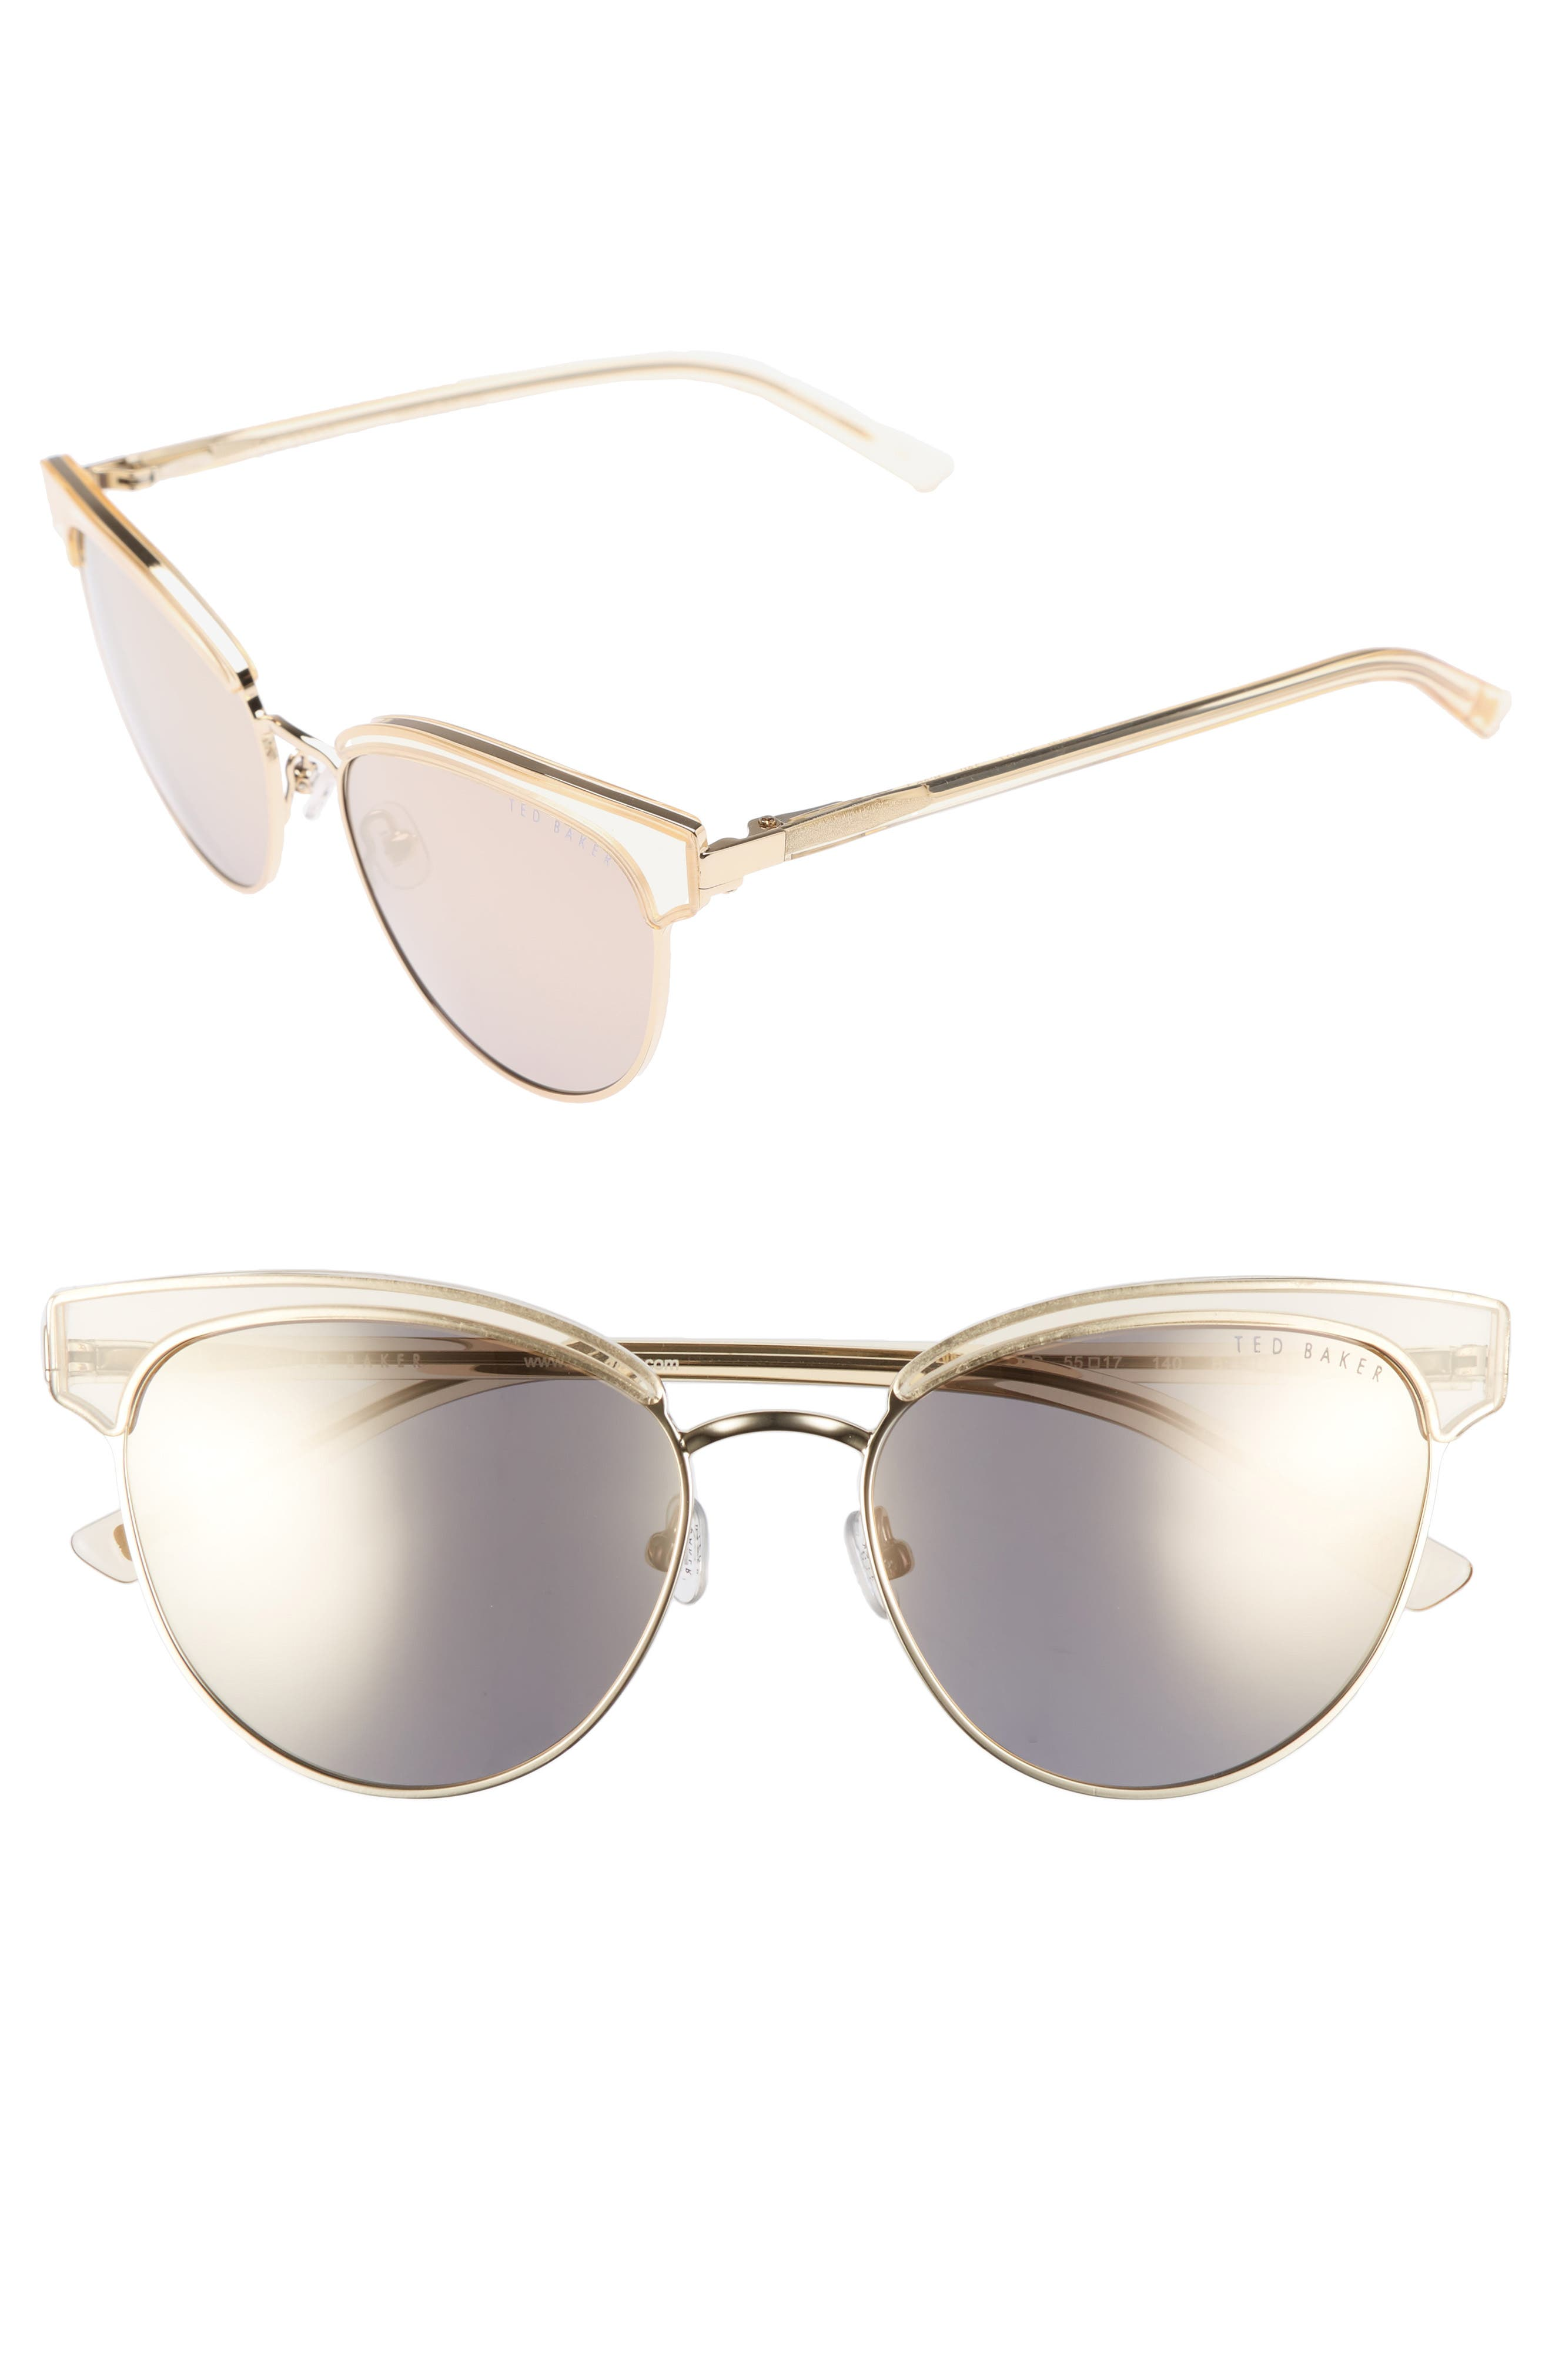 55mm Mirrored Semi Rimless Cat Eye Sunglasses,                             Main thumbnail 1, color,                             710